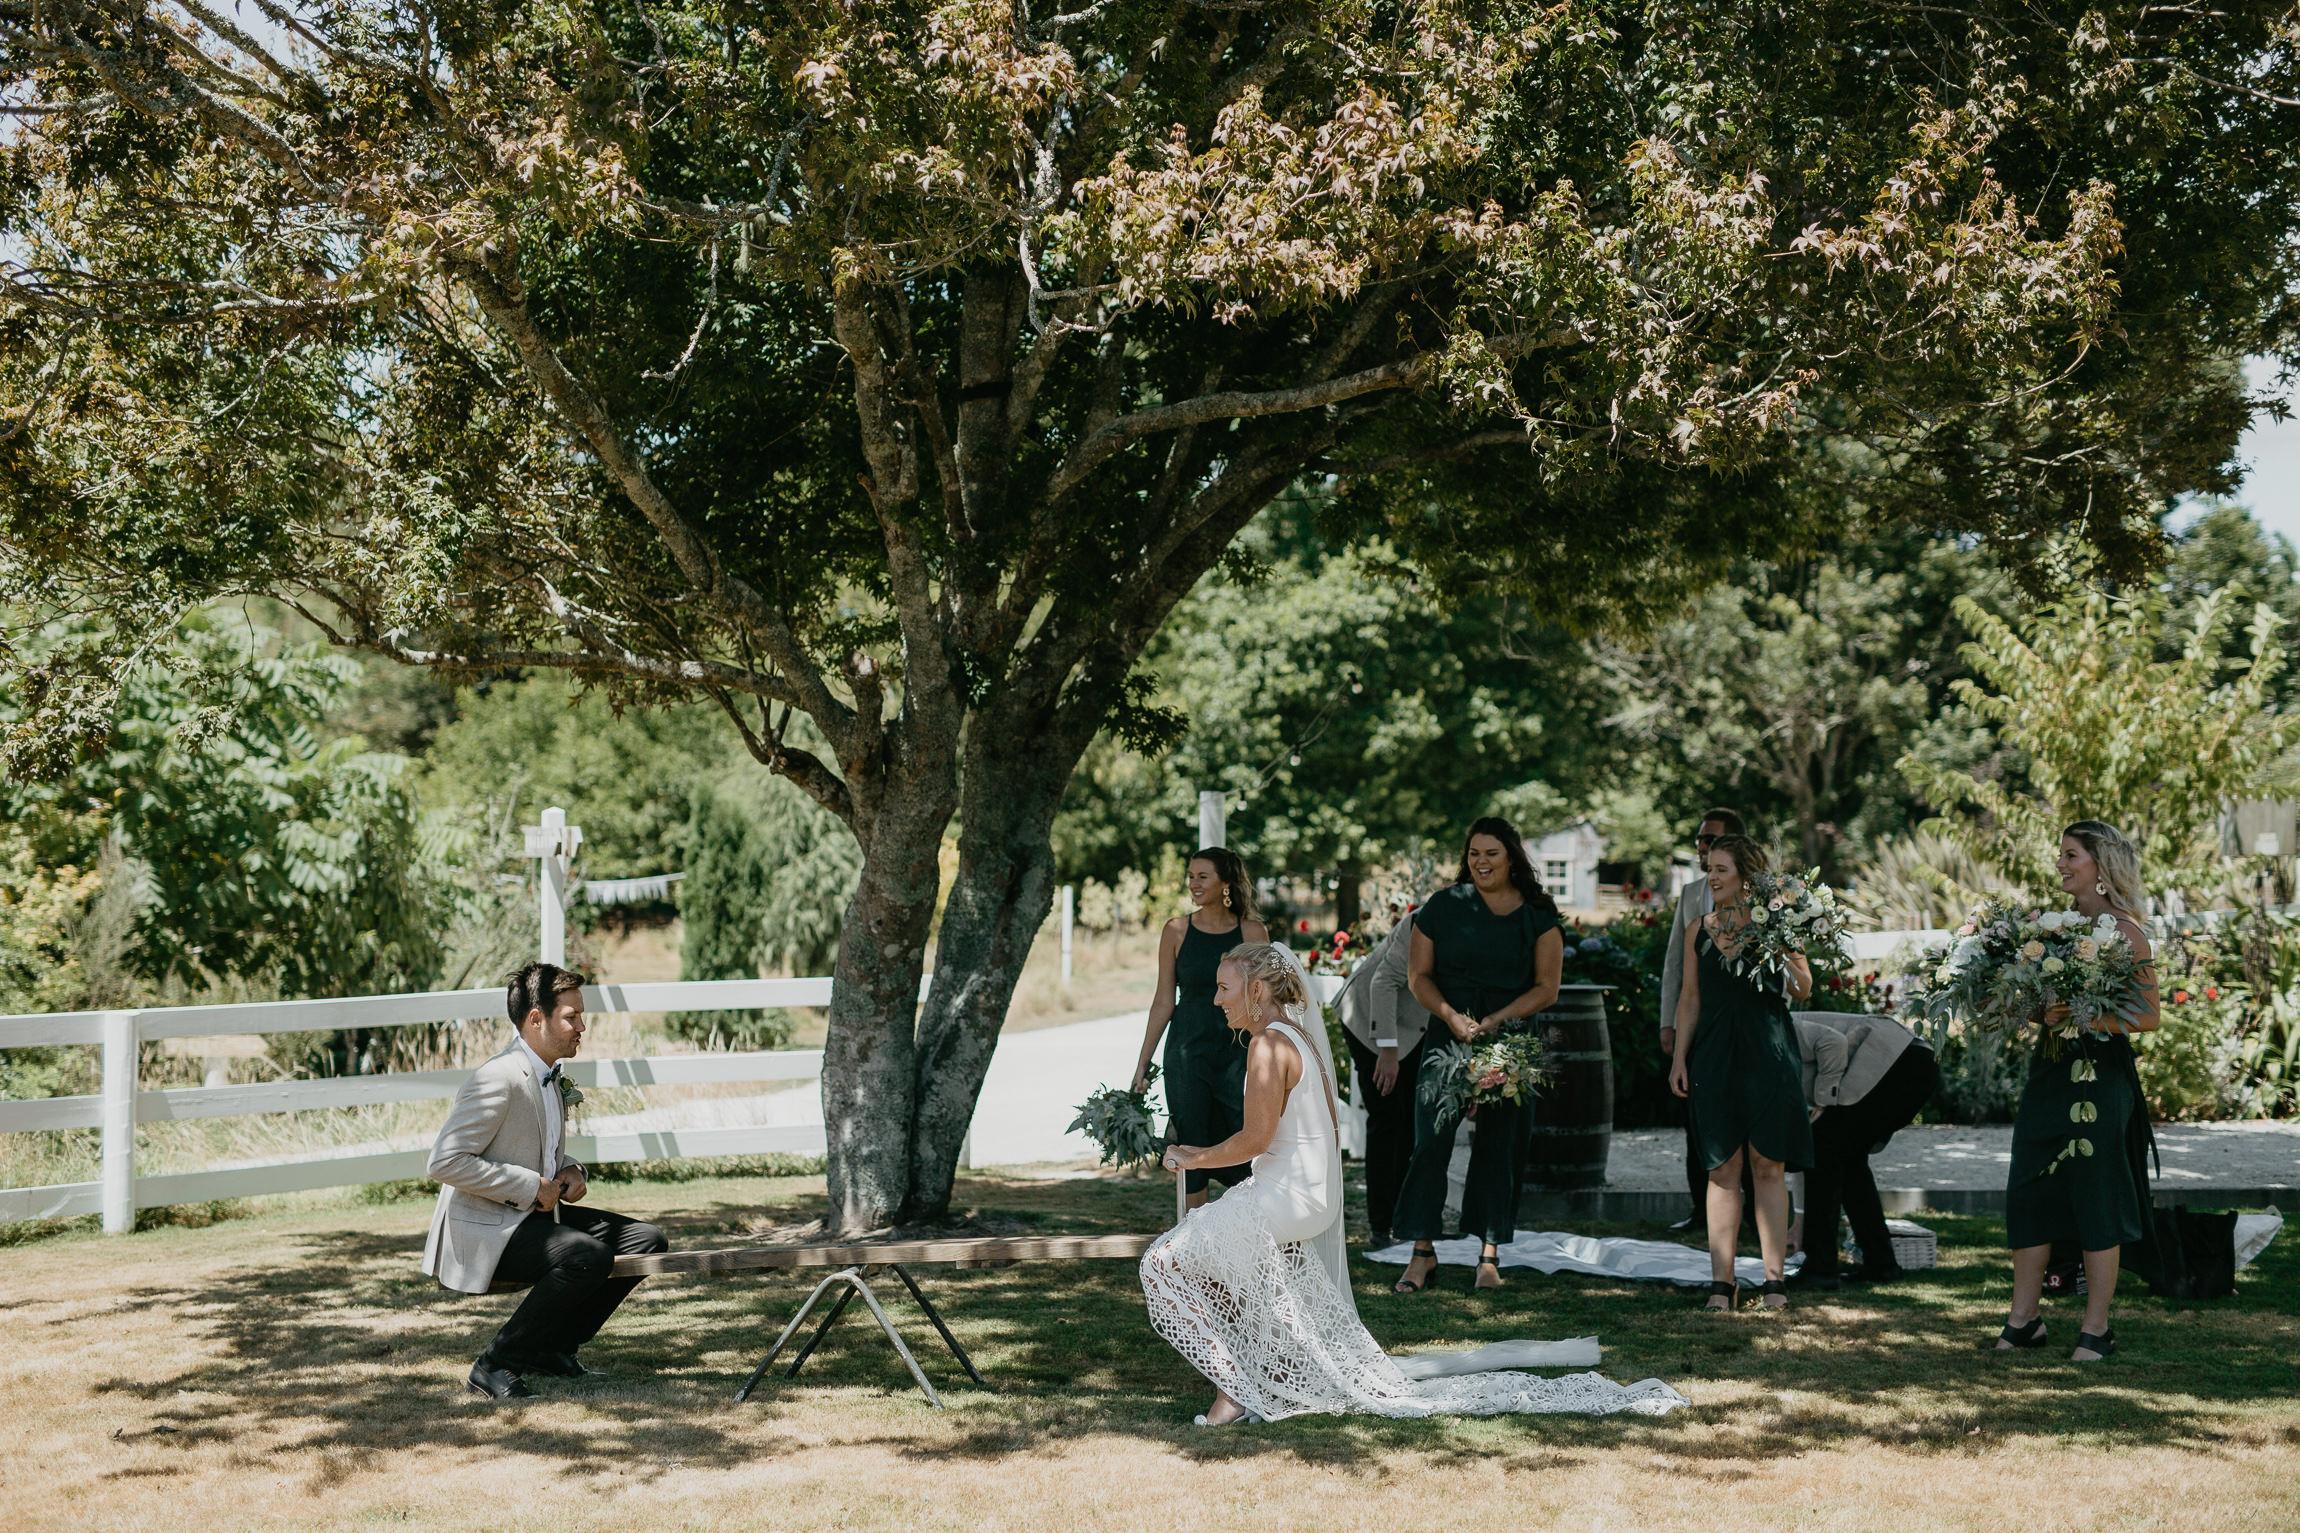 oldforestschool-wedding-blog-59.jpg